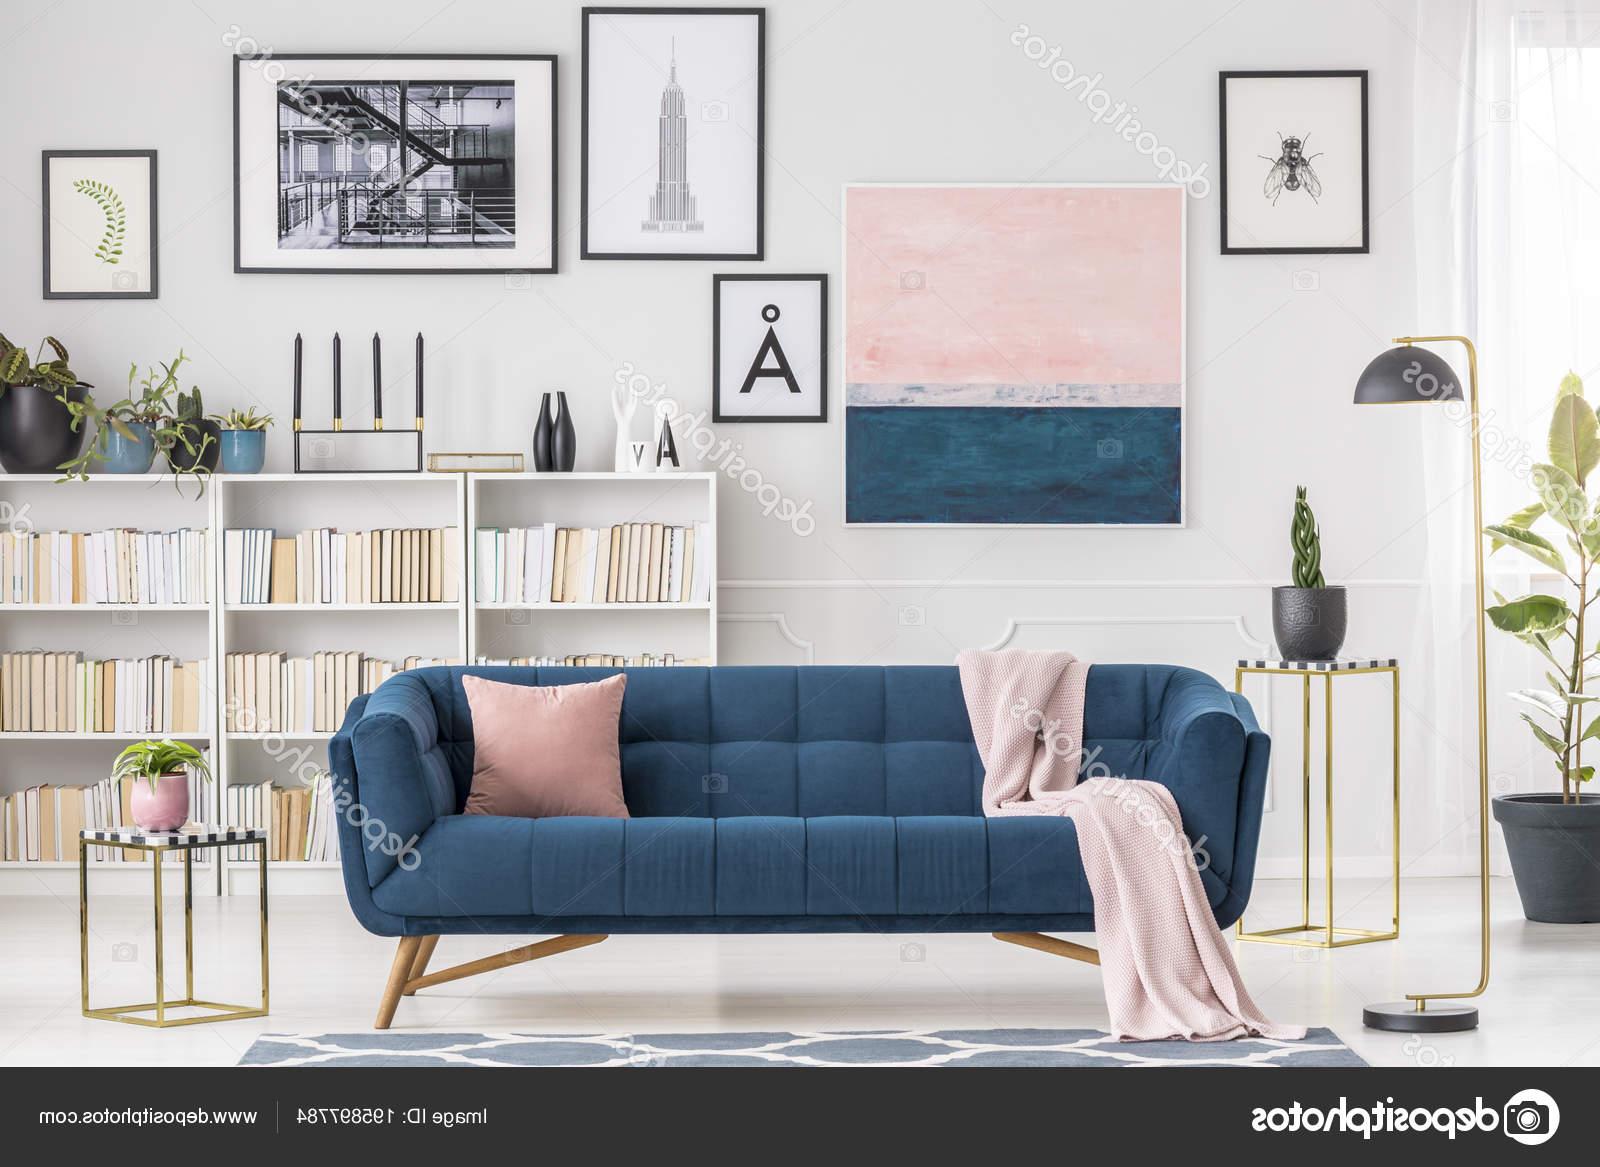 Sofa Azul Marino Gdd0 Rosa Manta sofà Azul Marino Interior Moderno Salà N Con Galerà A